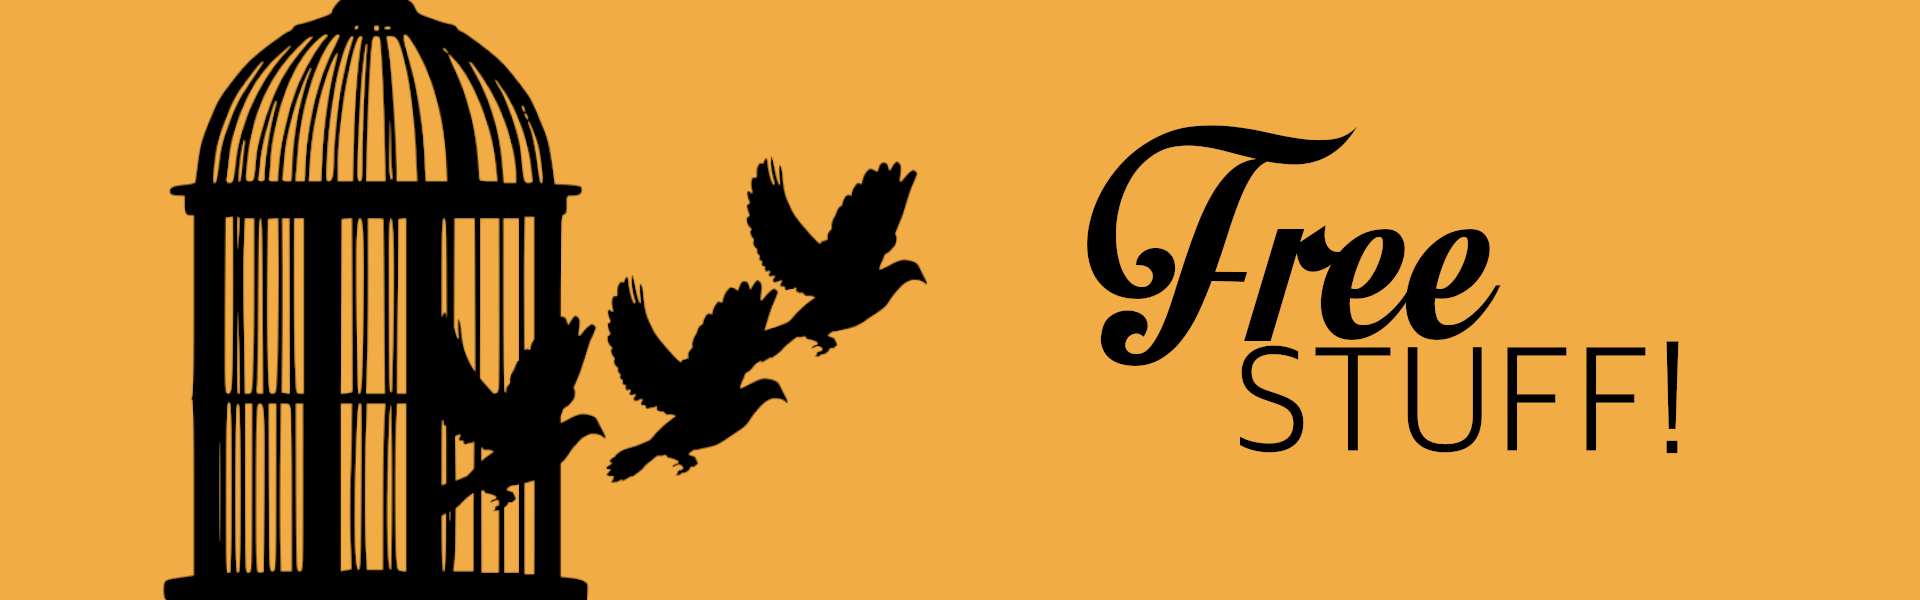 FREE STUFF BANNER BIRD CAGE gold